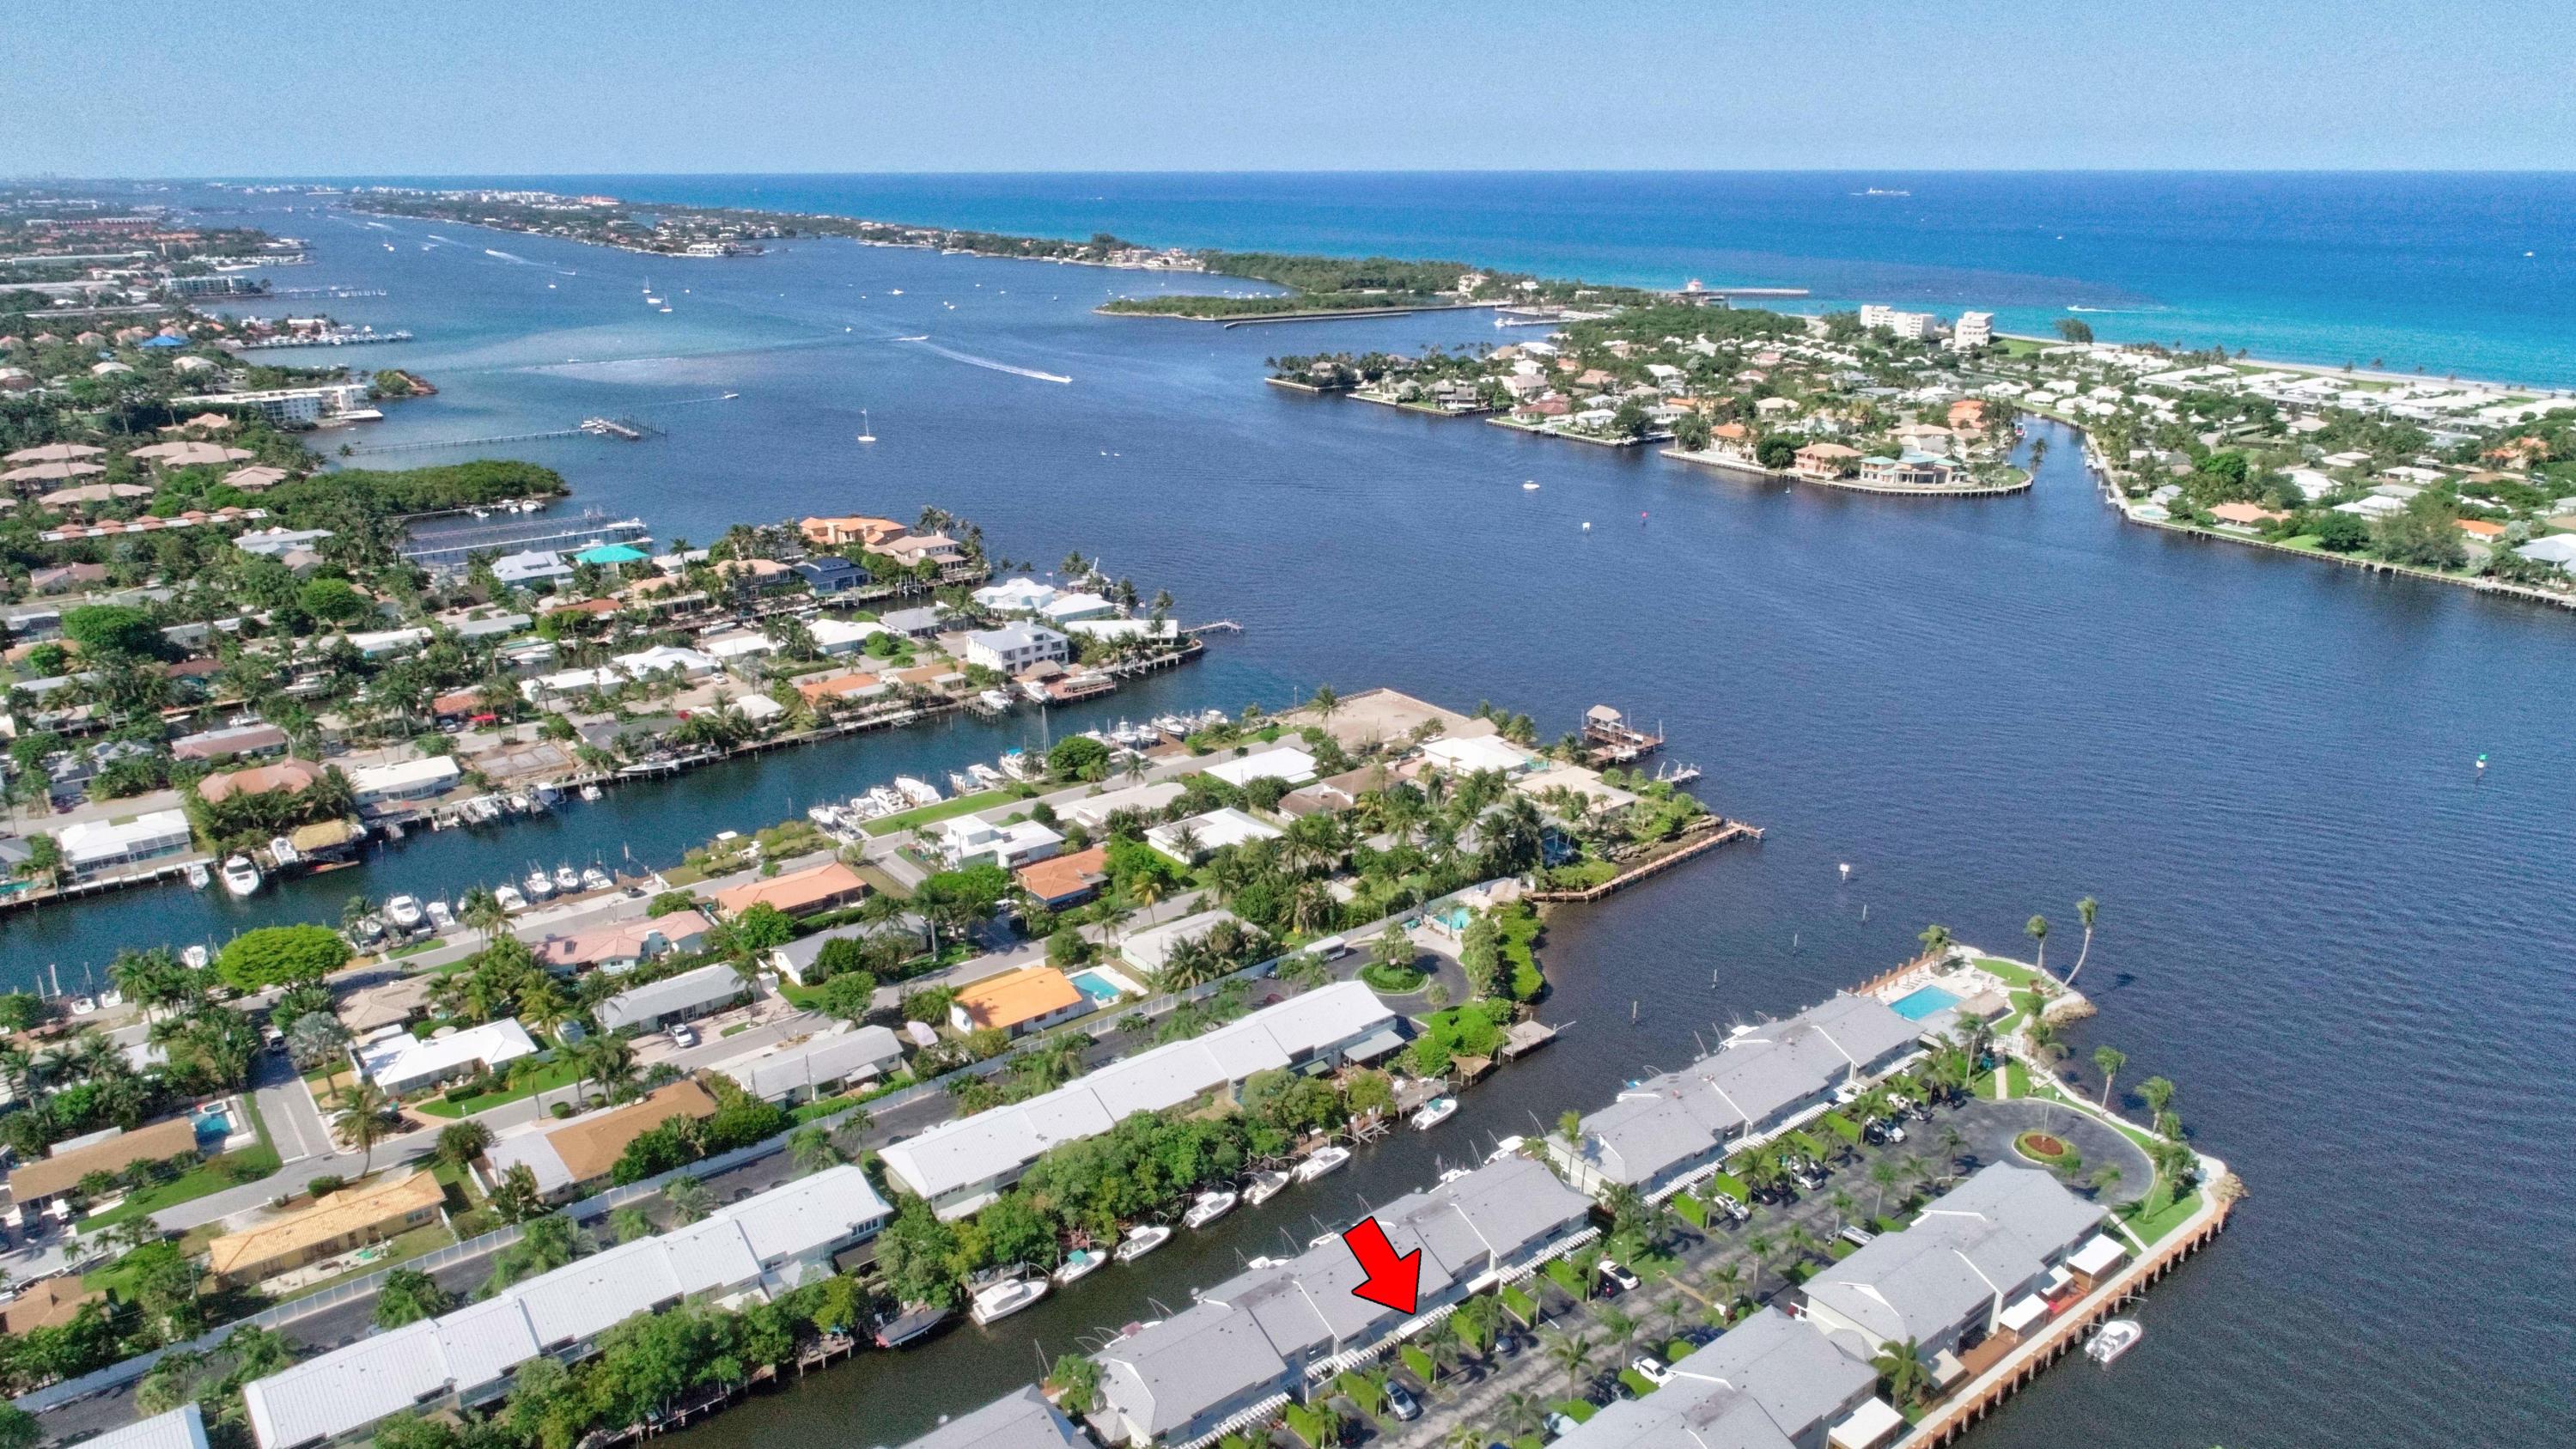 731 NE 12th Ter 5 Terrace 5 Boynton Beach, FL 33435